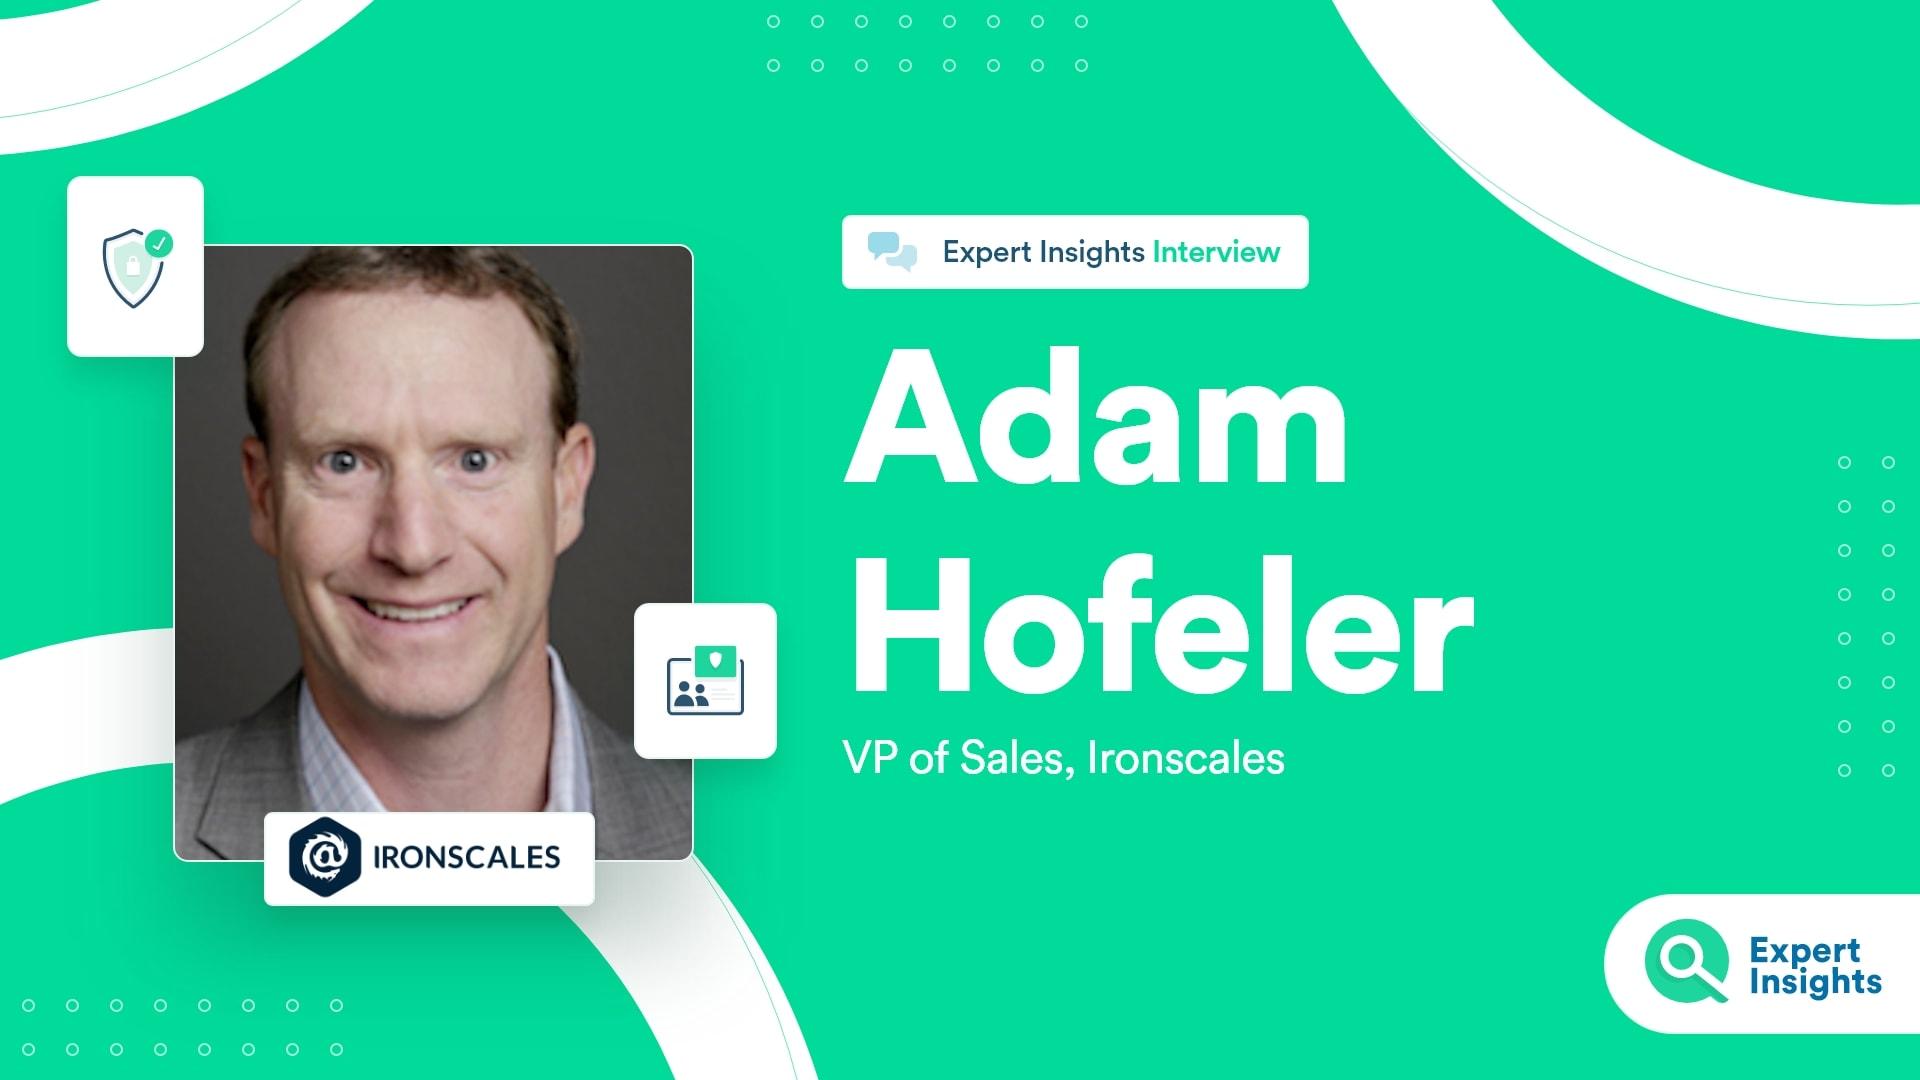 Interview With Adam Hofeler Of Ironscales - Expert Insights